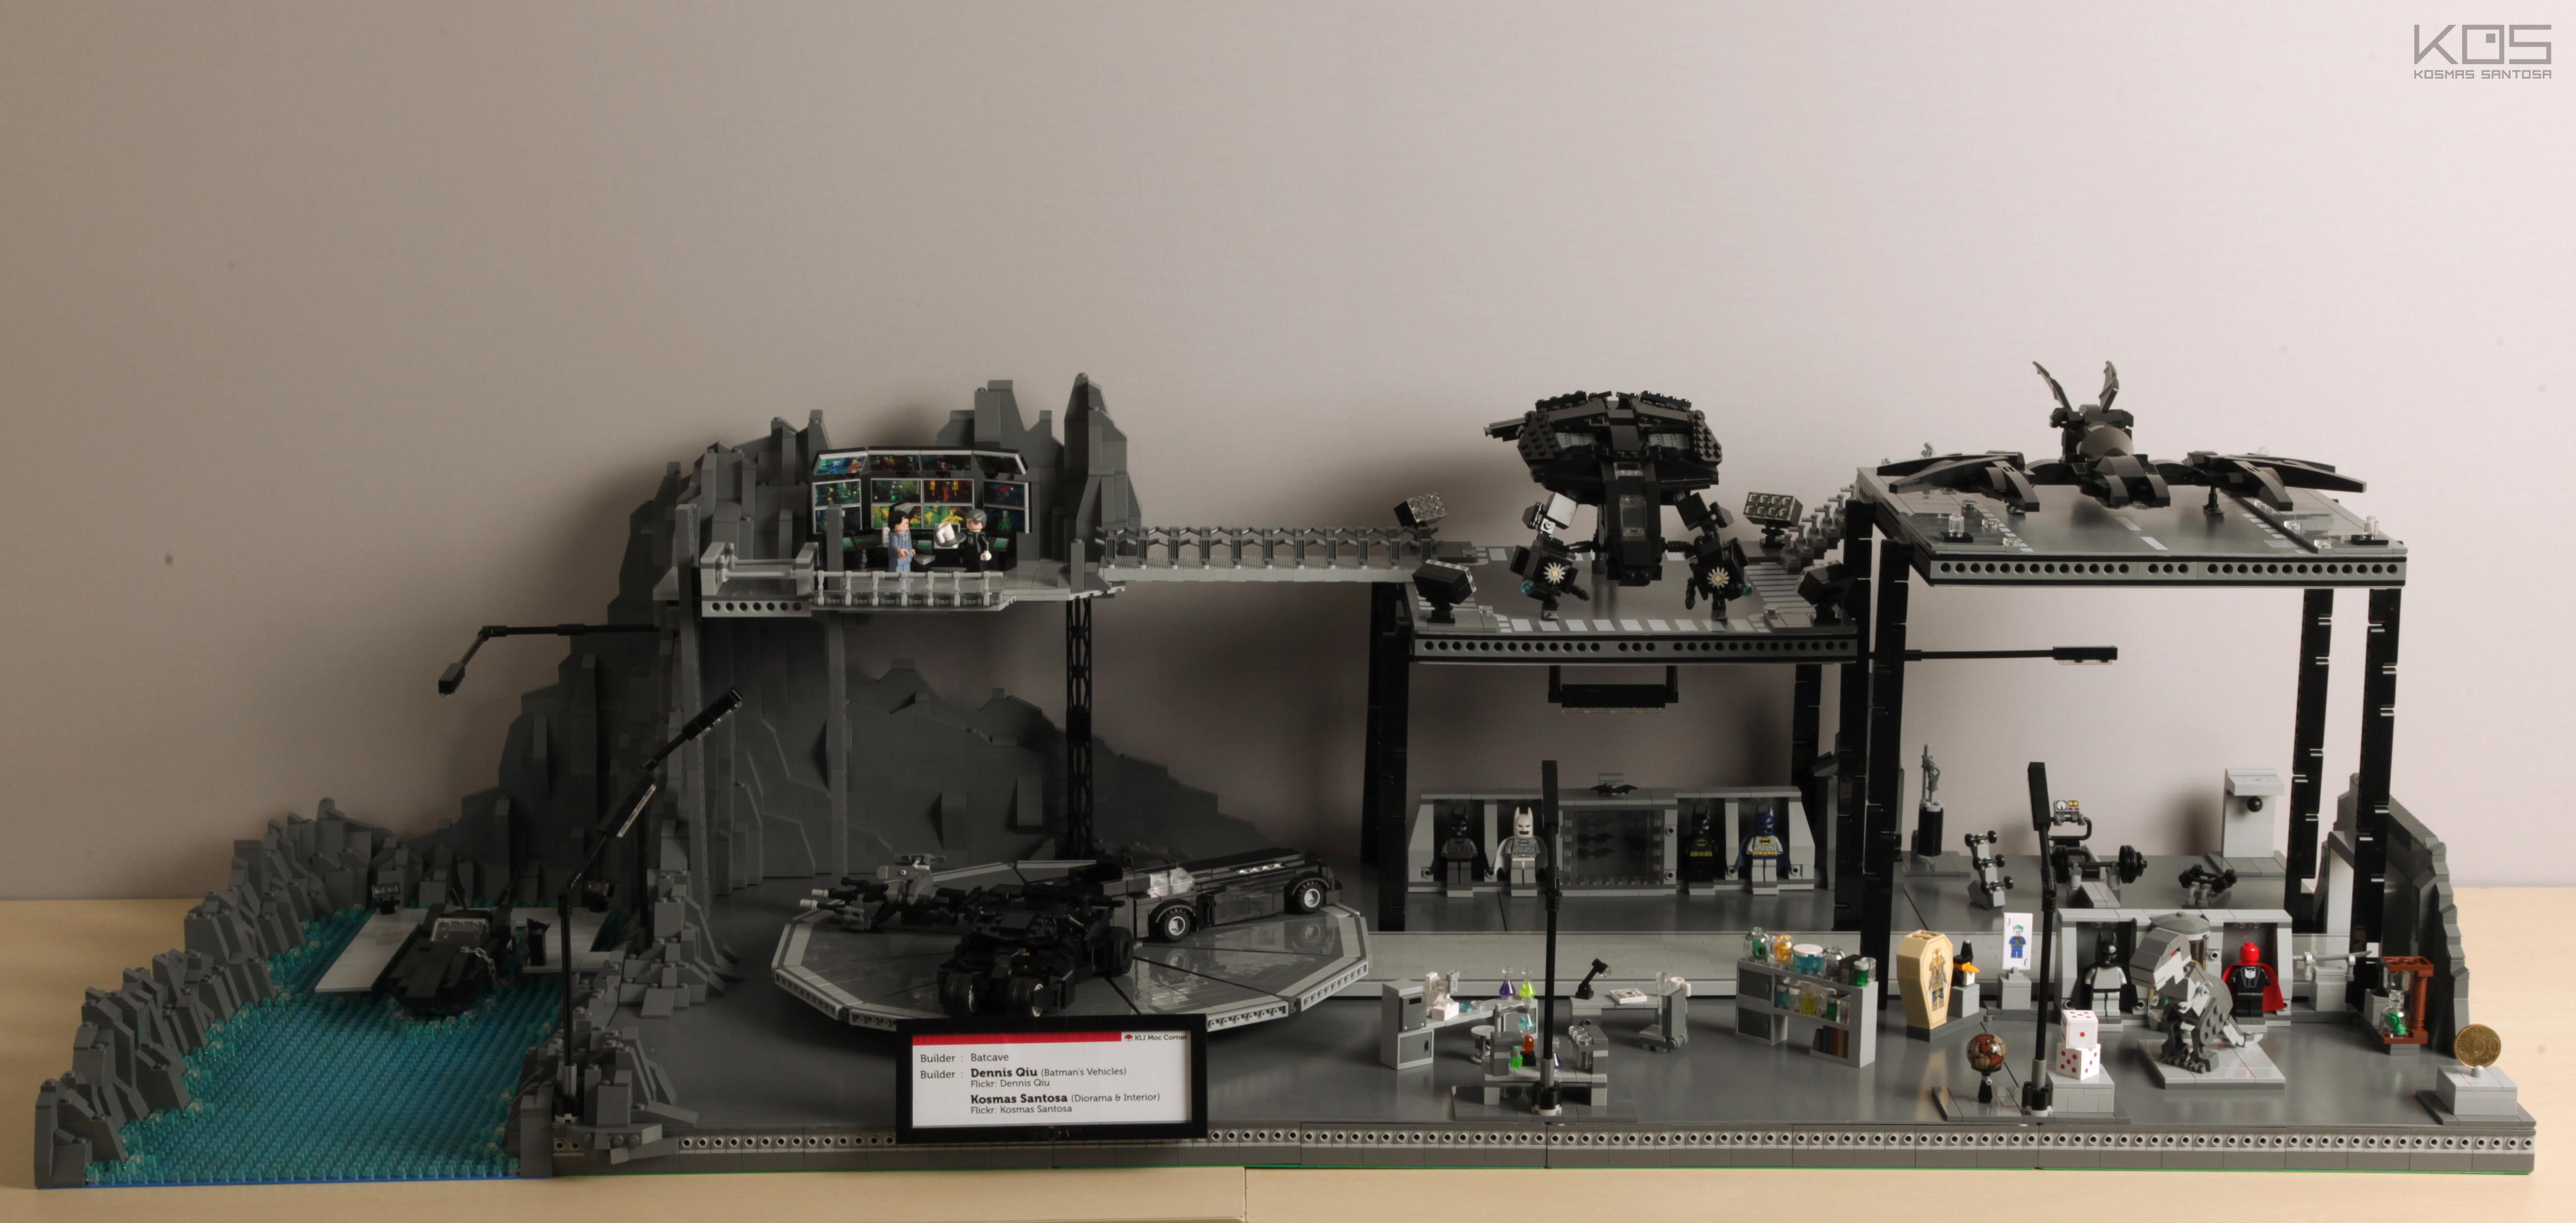 Batcave lab LEGO tech Bruce wayne elevator bat Batman Alfred cave controlroom gym Batmobile Headquarter thebat